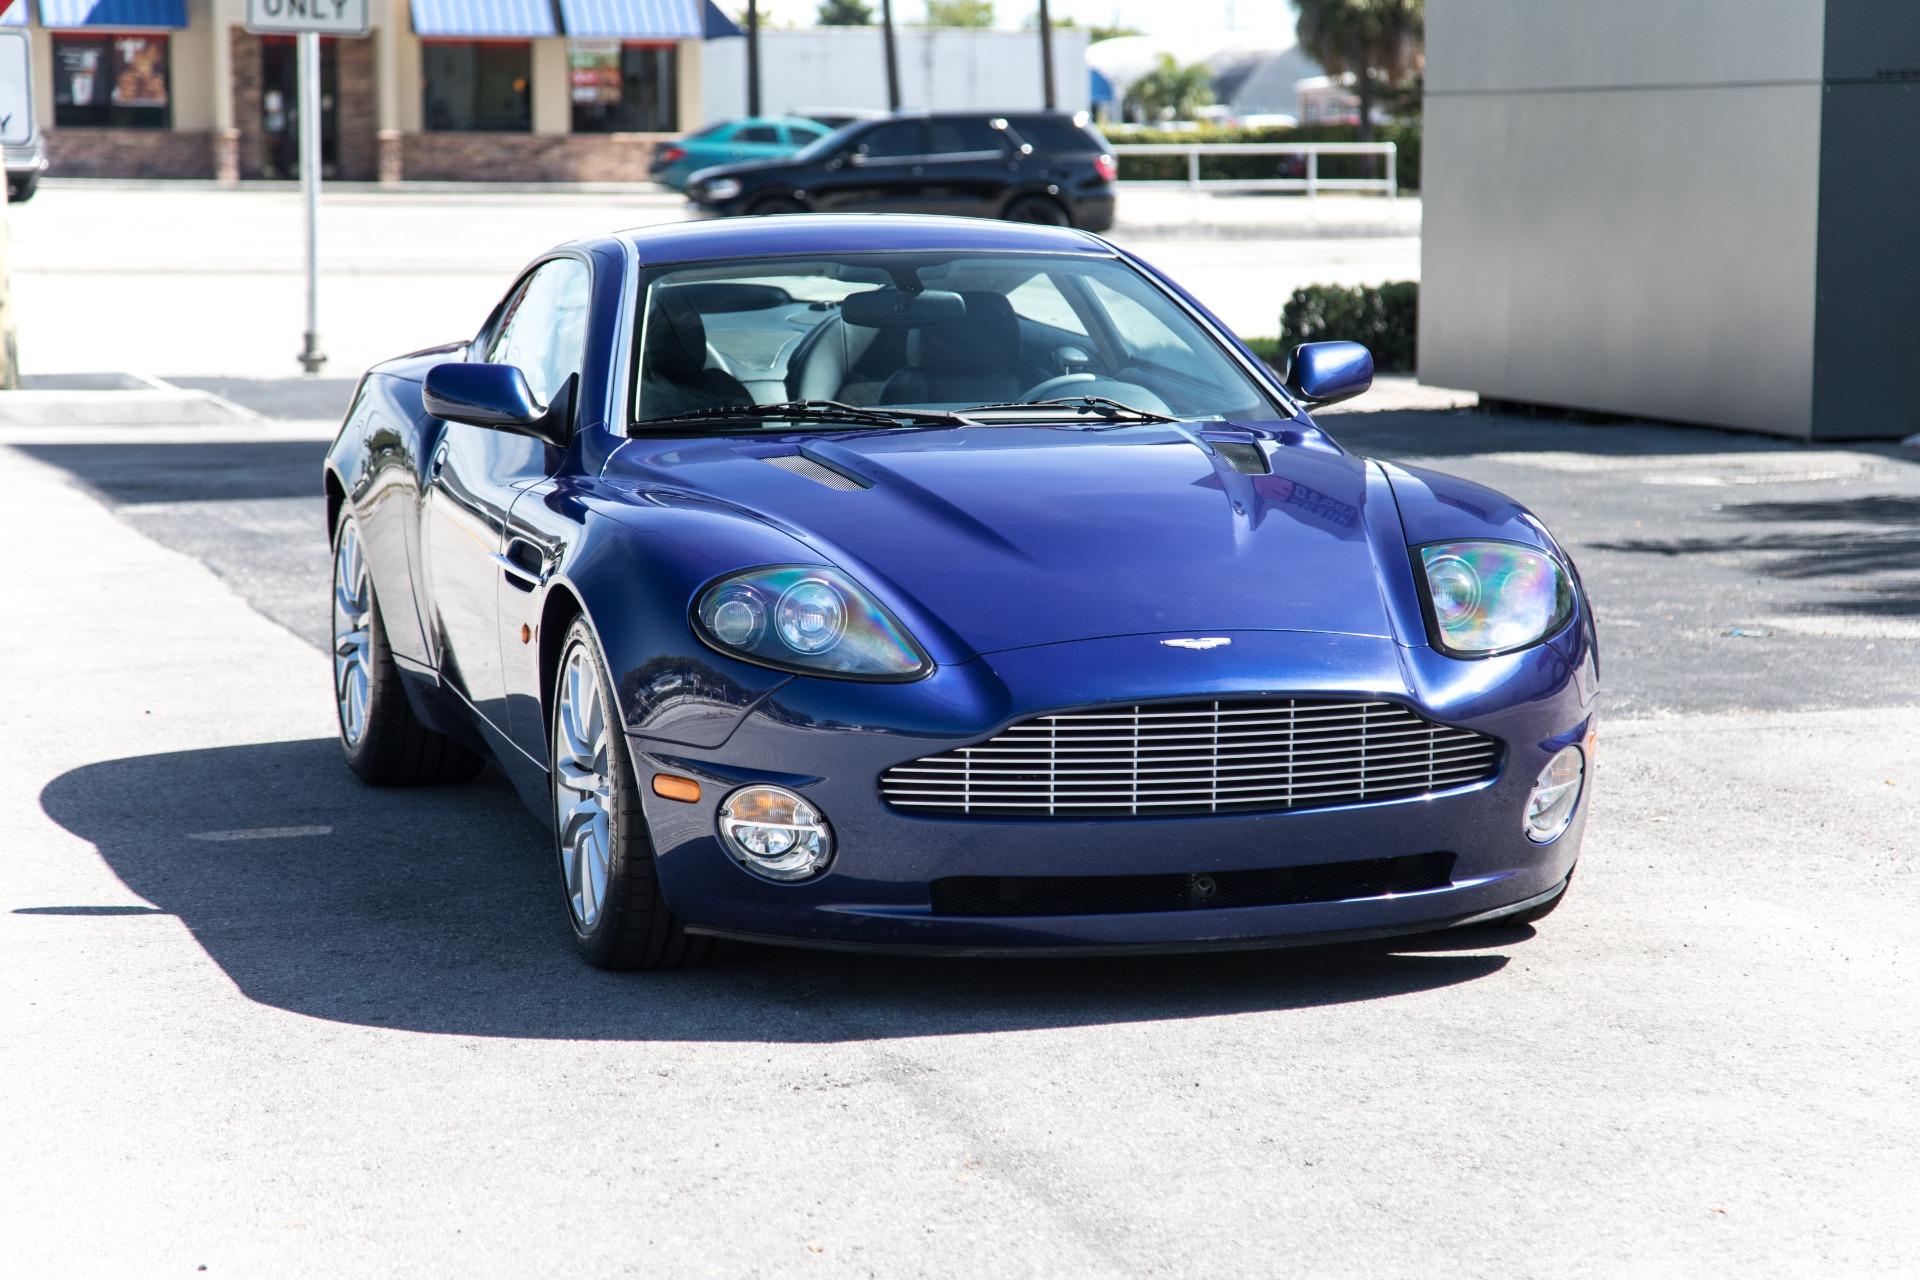 Used-2002-Aston-Martin-V12-Vanquish